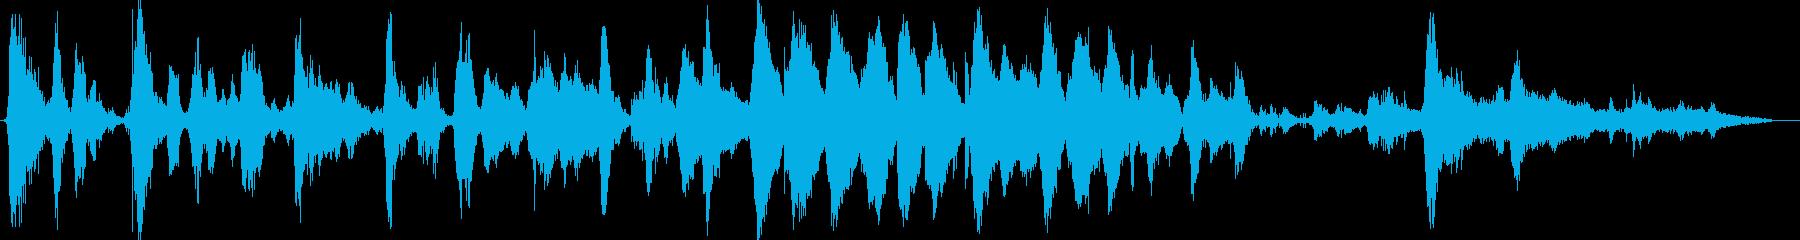 ACOの再生済みの波形